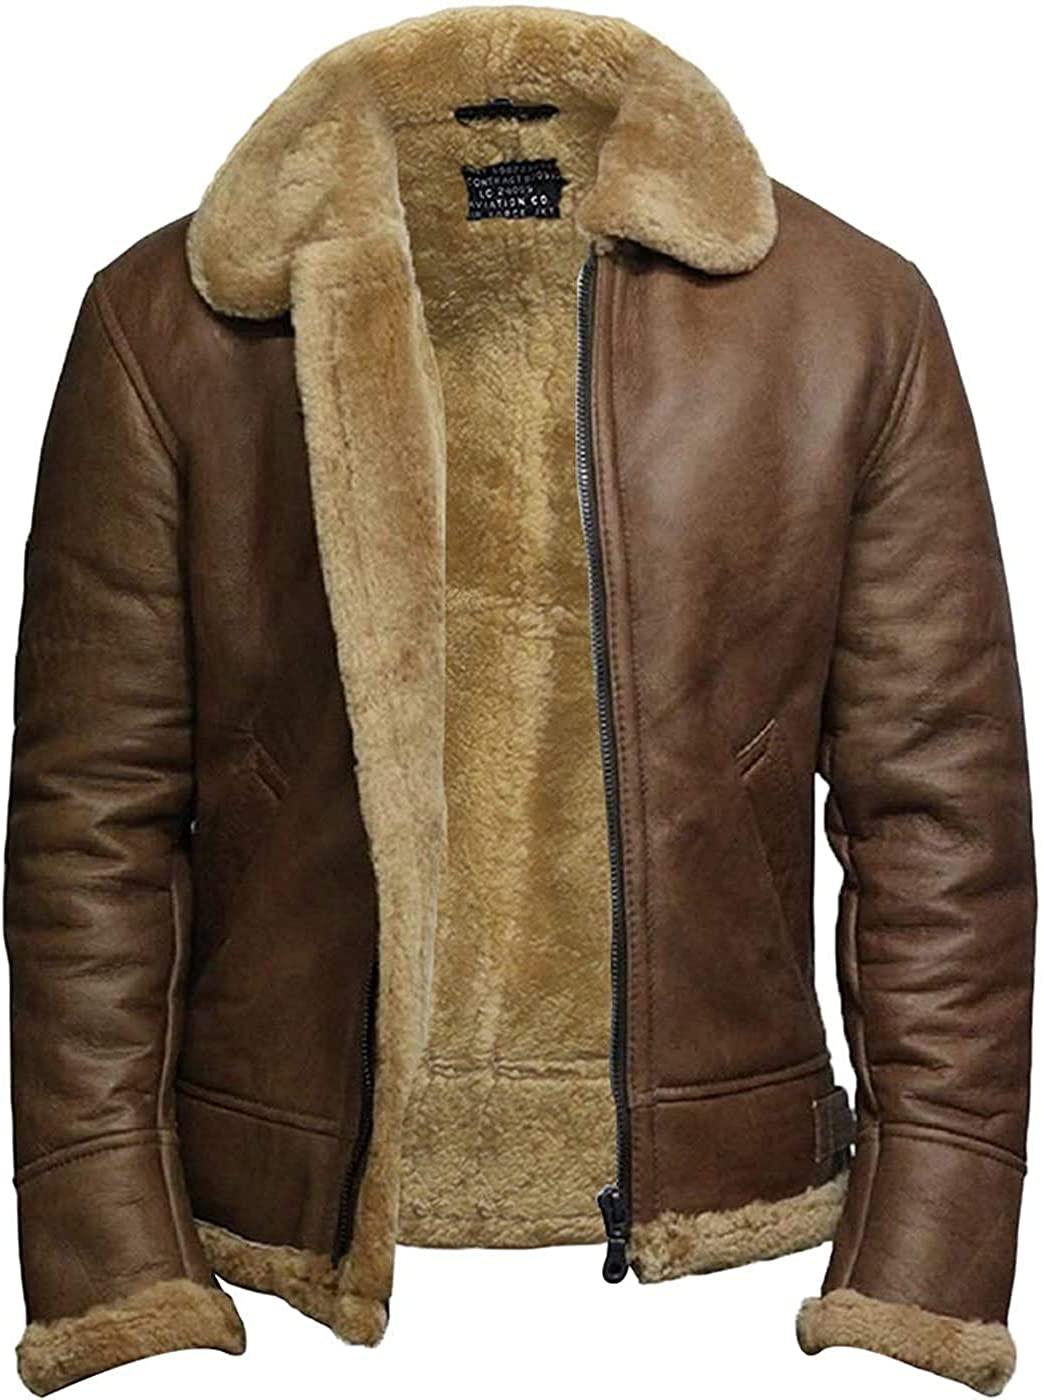 BRANDSLOCK Mens Genuine Shearling Sheepskin Leather Ricardo Jacket